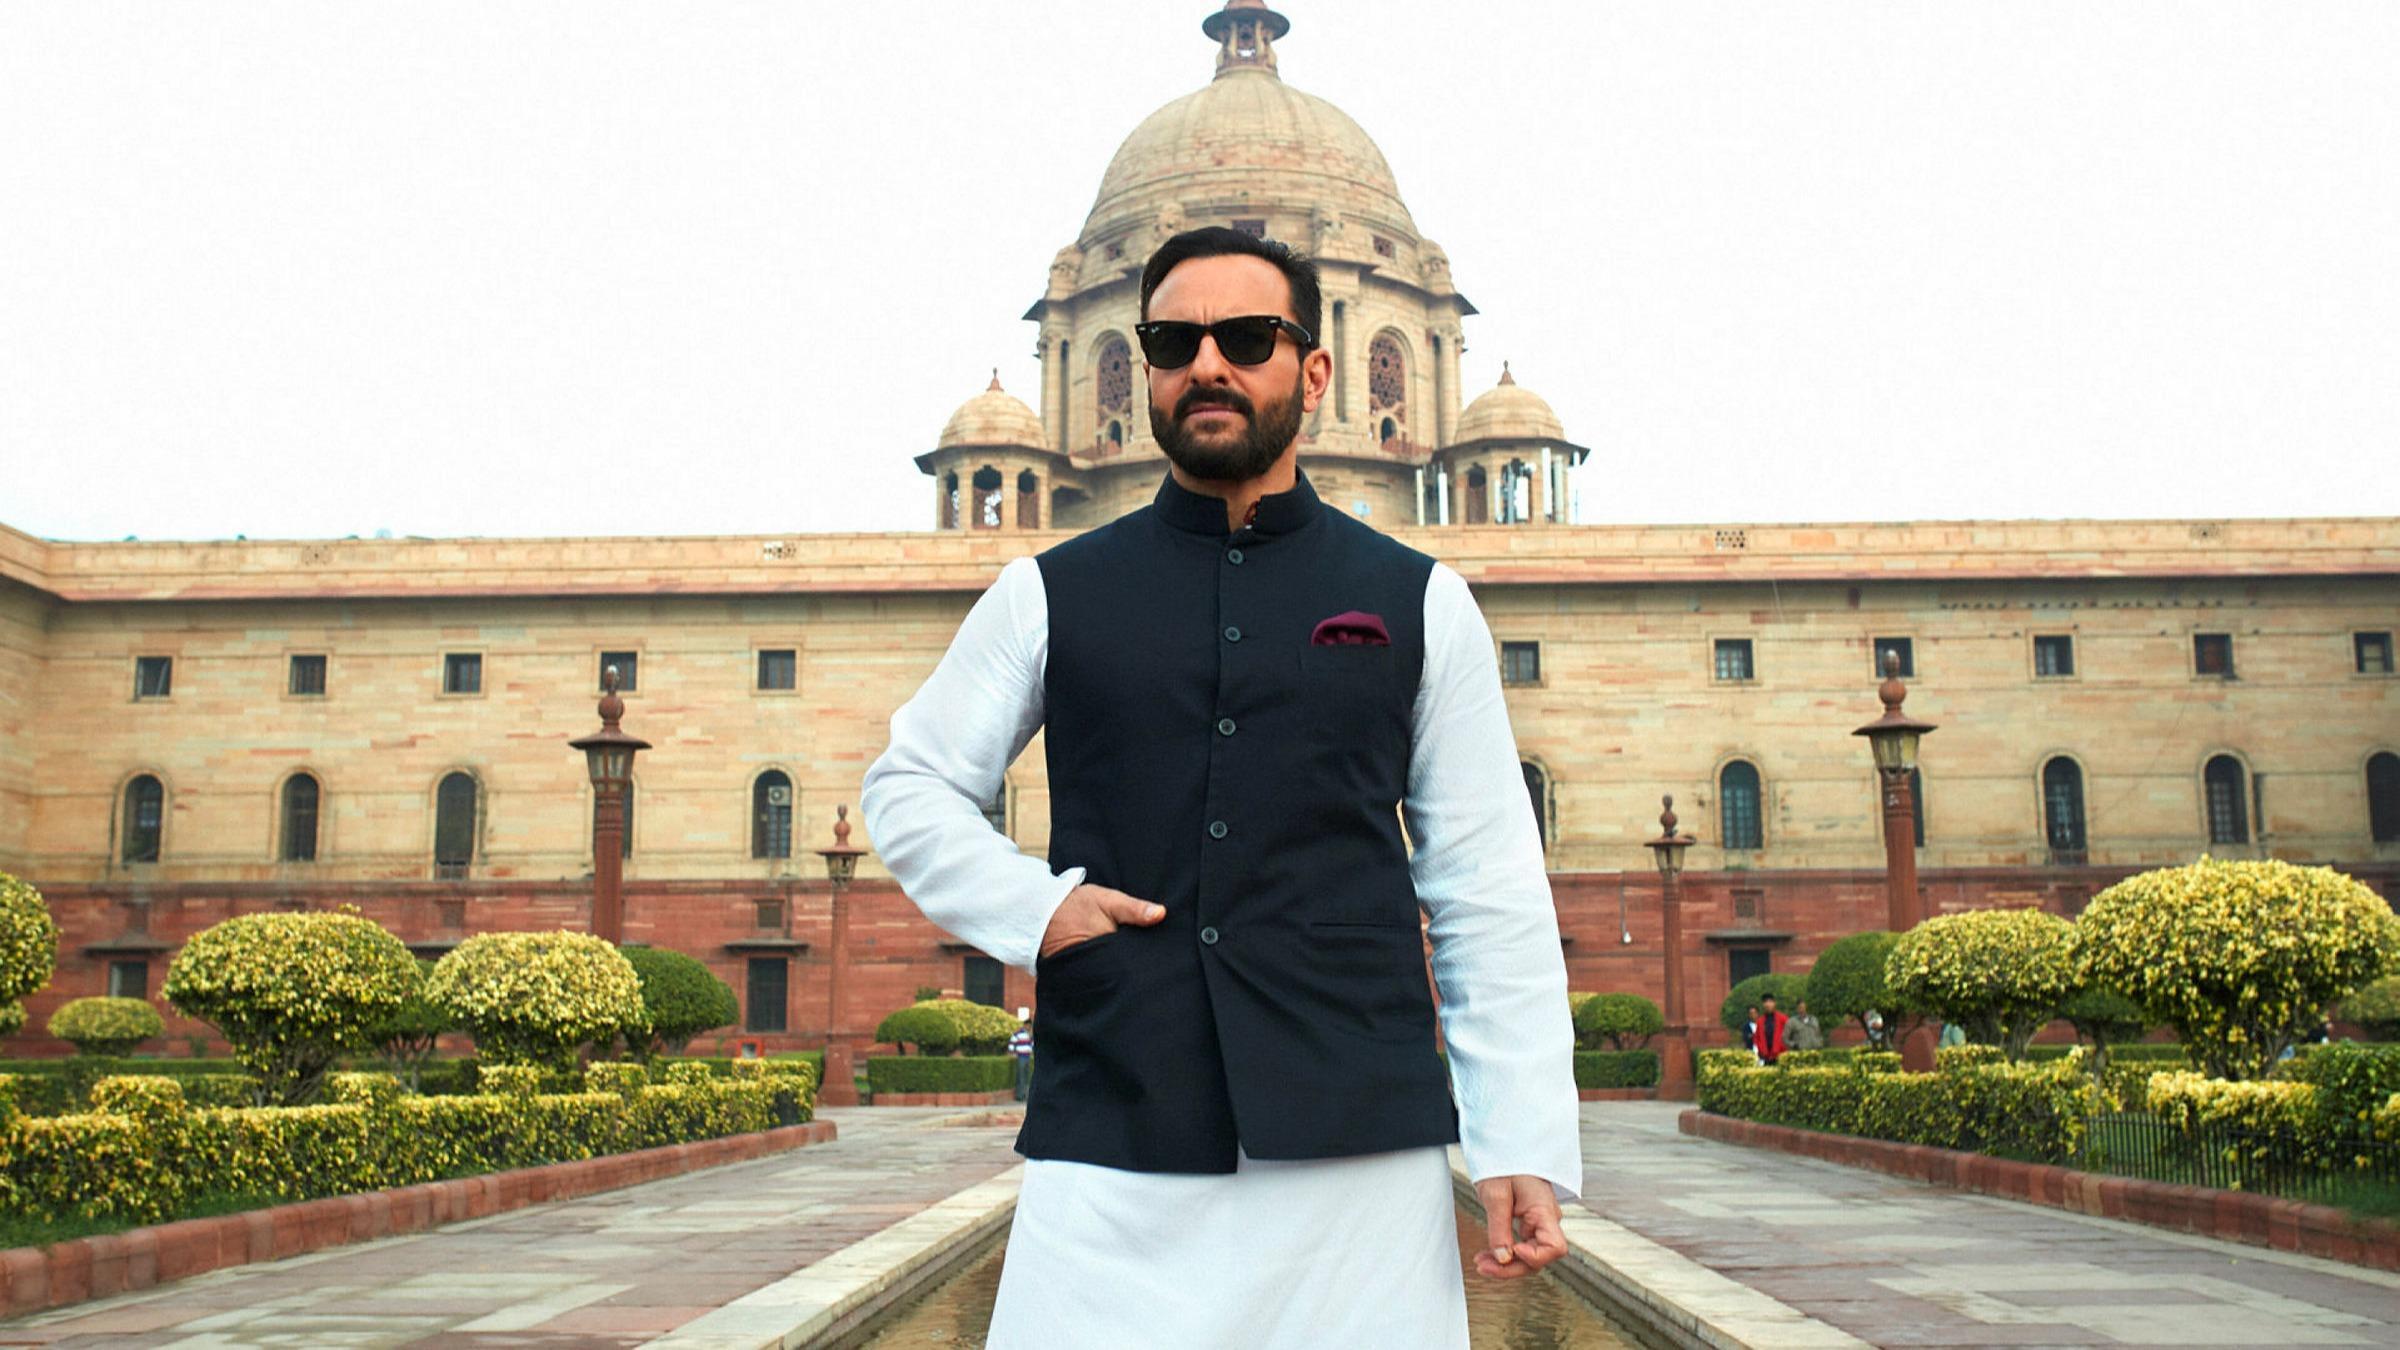 Saif Ali Khan — India's screen prince on getting gritty | Financial Times